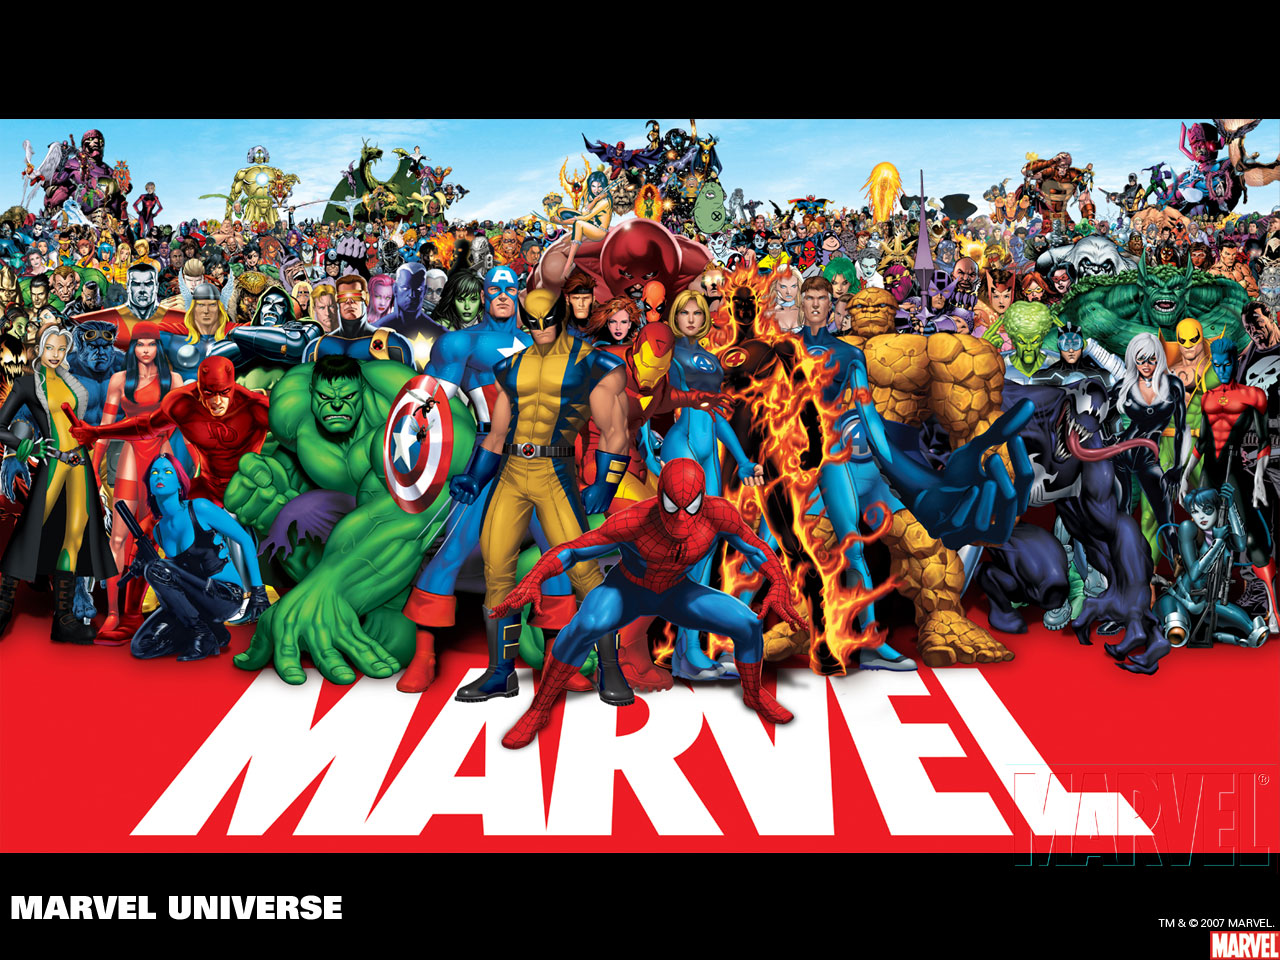 http://3.bp.blogspot.com/-HMsVxQiesBY/TeKzavfkEBI/AAAAAAAAAP8/7By_5PWVFXc/s1600/marvel_comics_wallpaper_marveluniverse.jpg